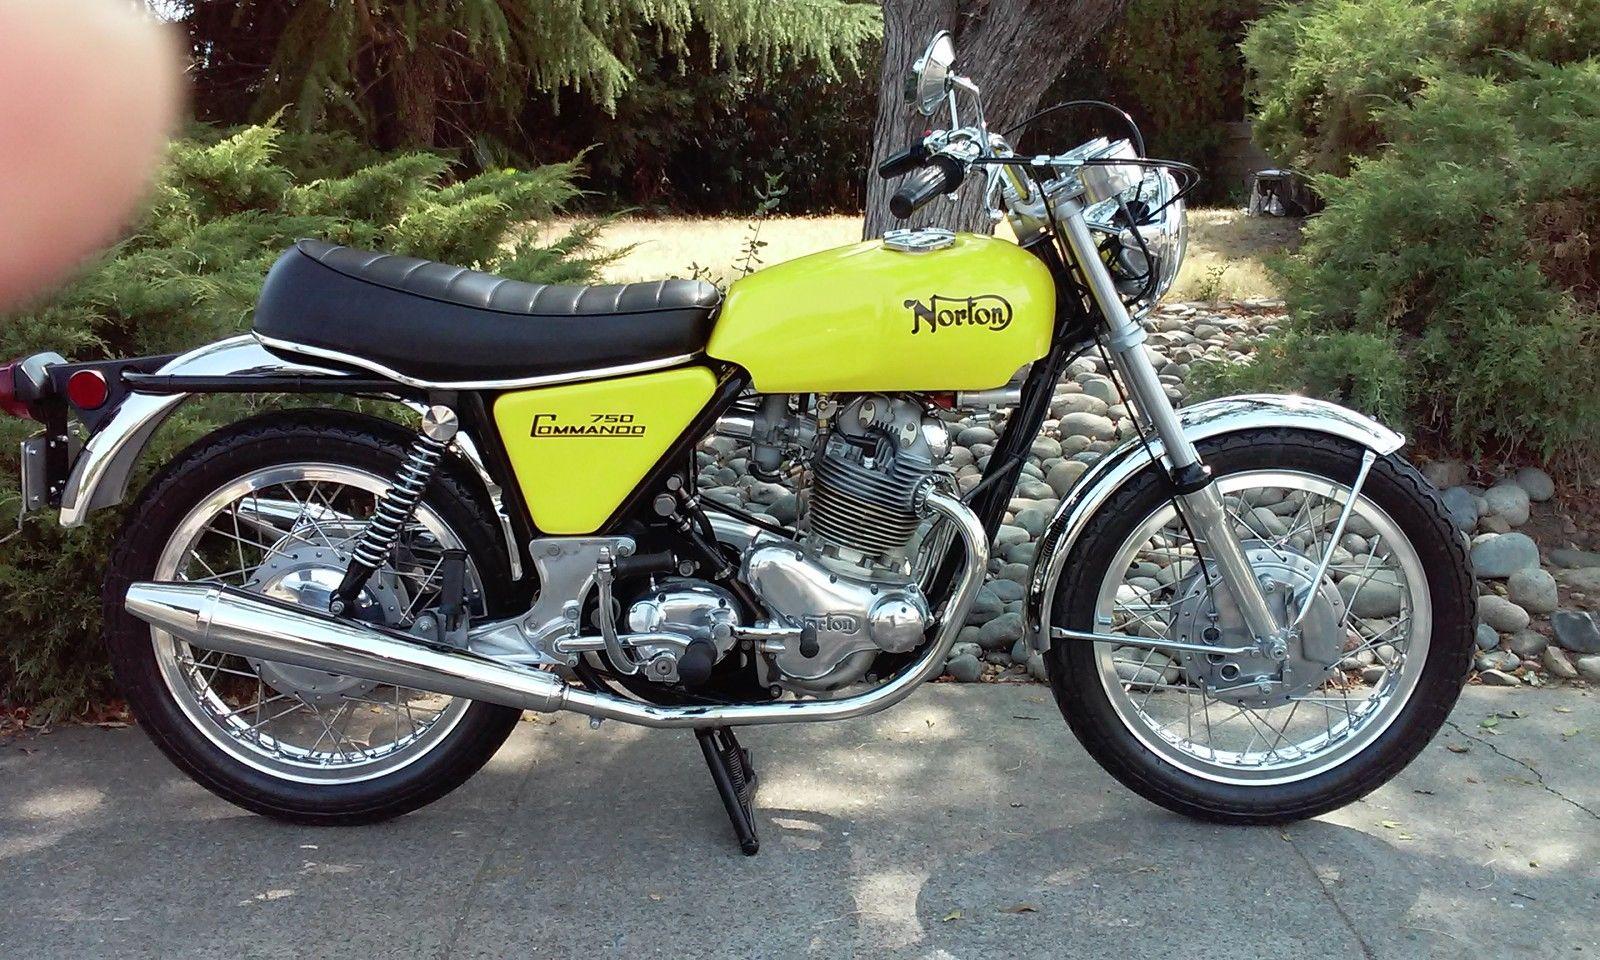 Restored Norton Commando 1970 Photographs At Classic Bikes Restored Bikes Restored